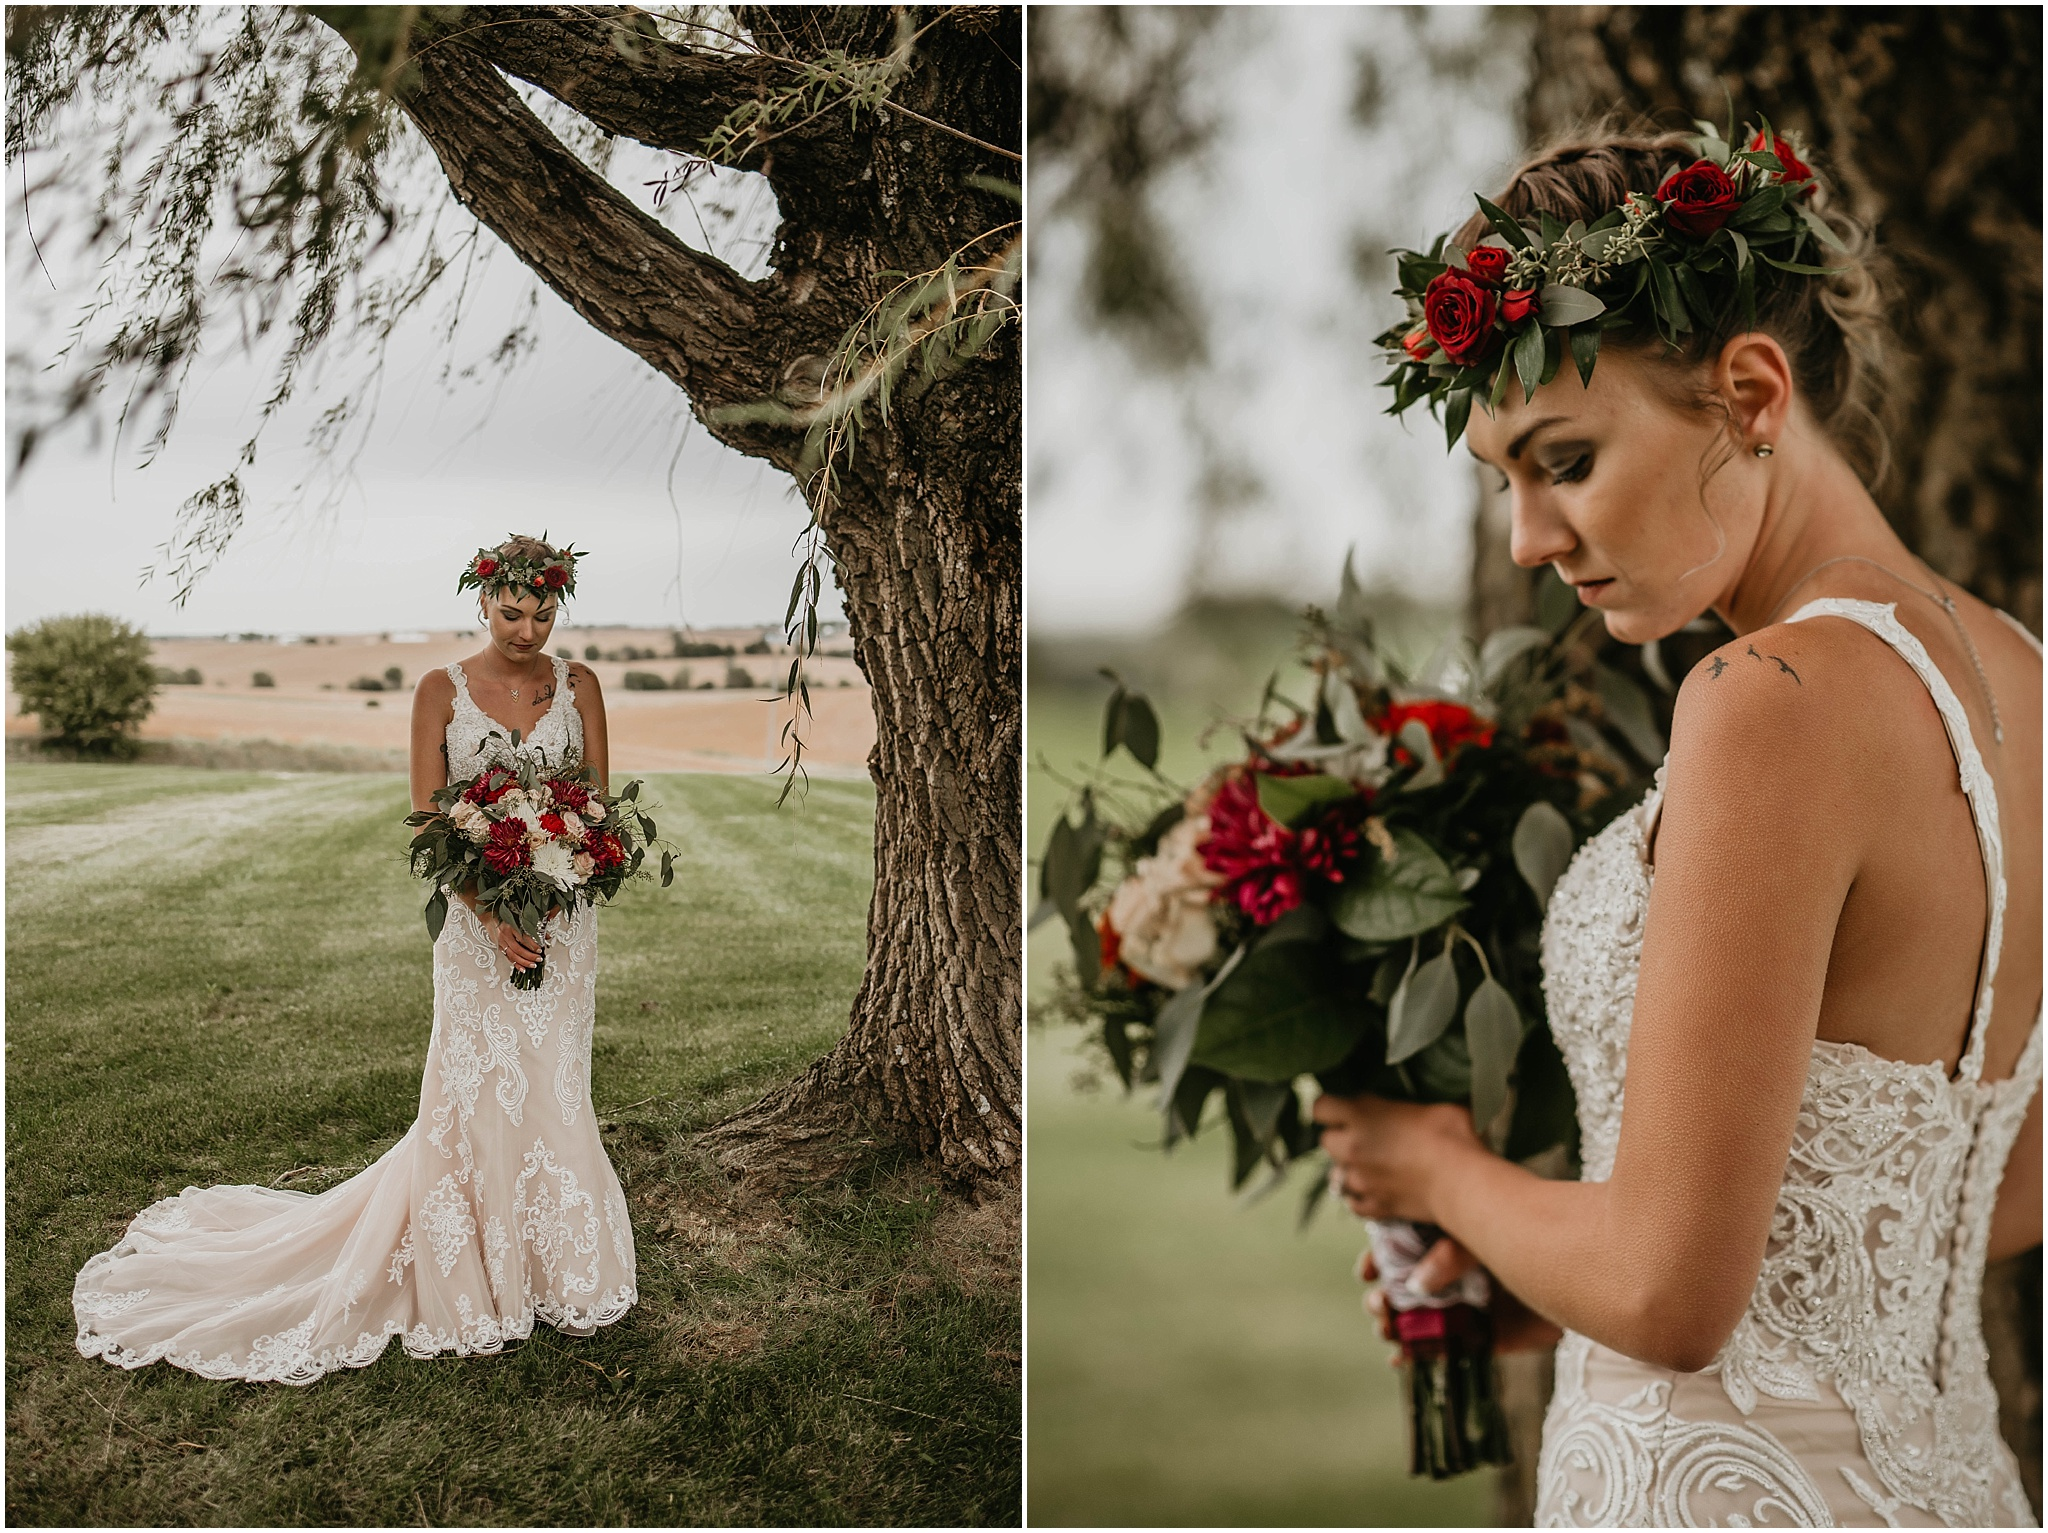 DesMoines-Iowa-Wedding-Photography-Destination-Photographer_0157.jpg